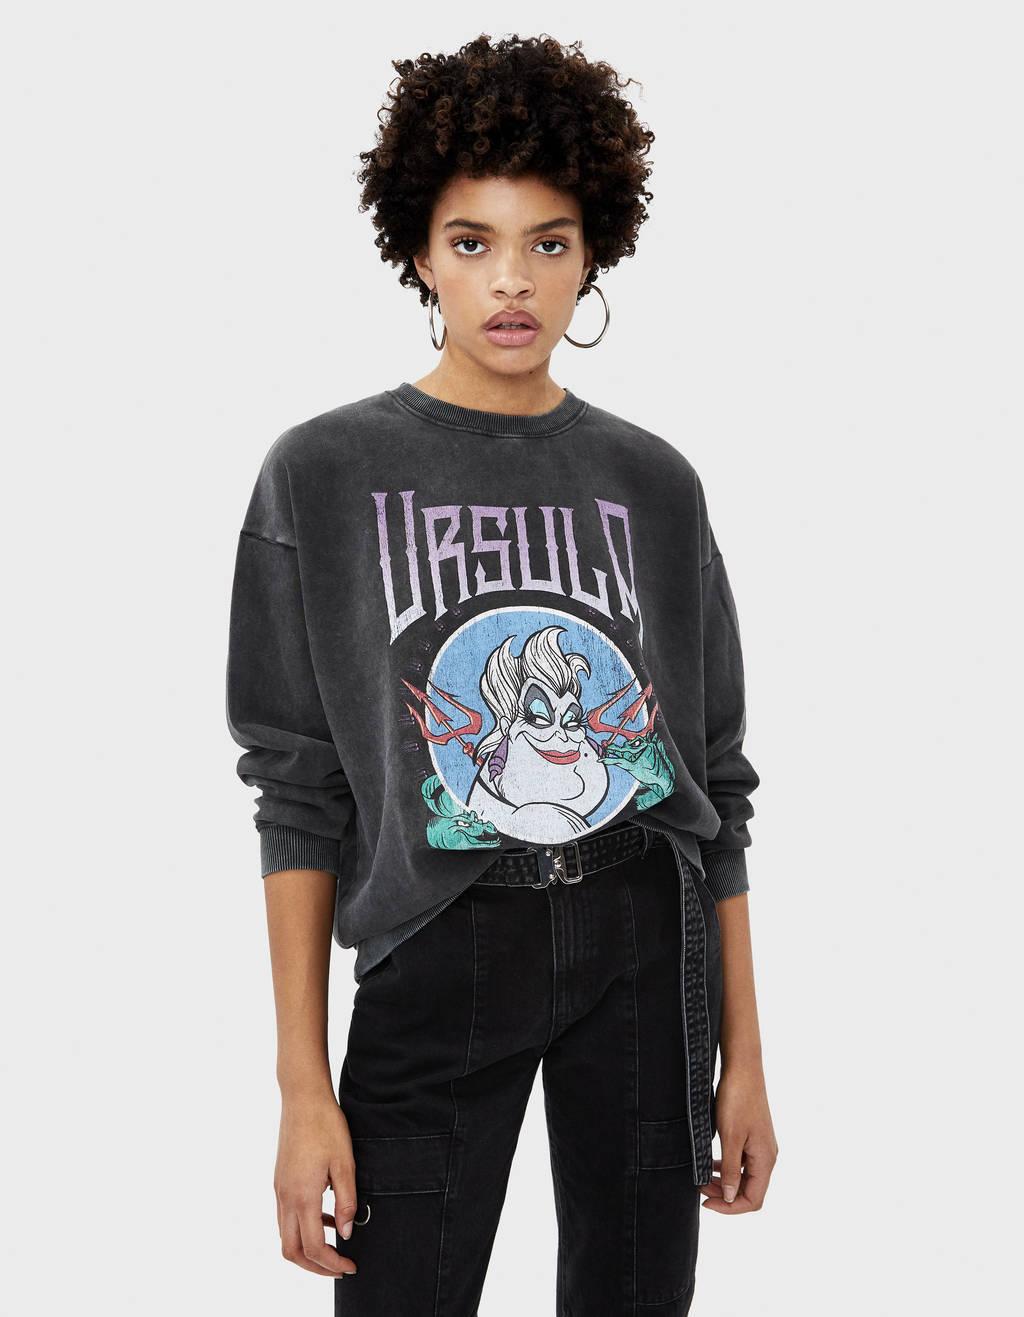 Ursula sweatshirt